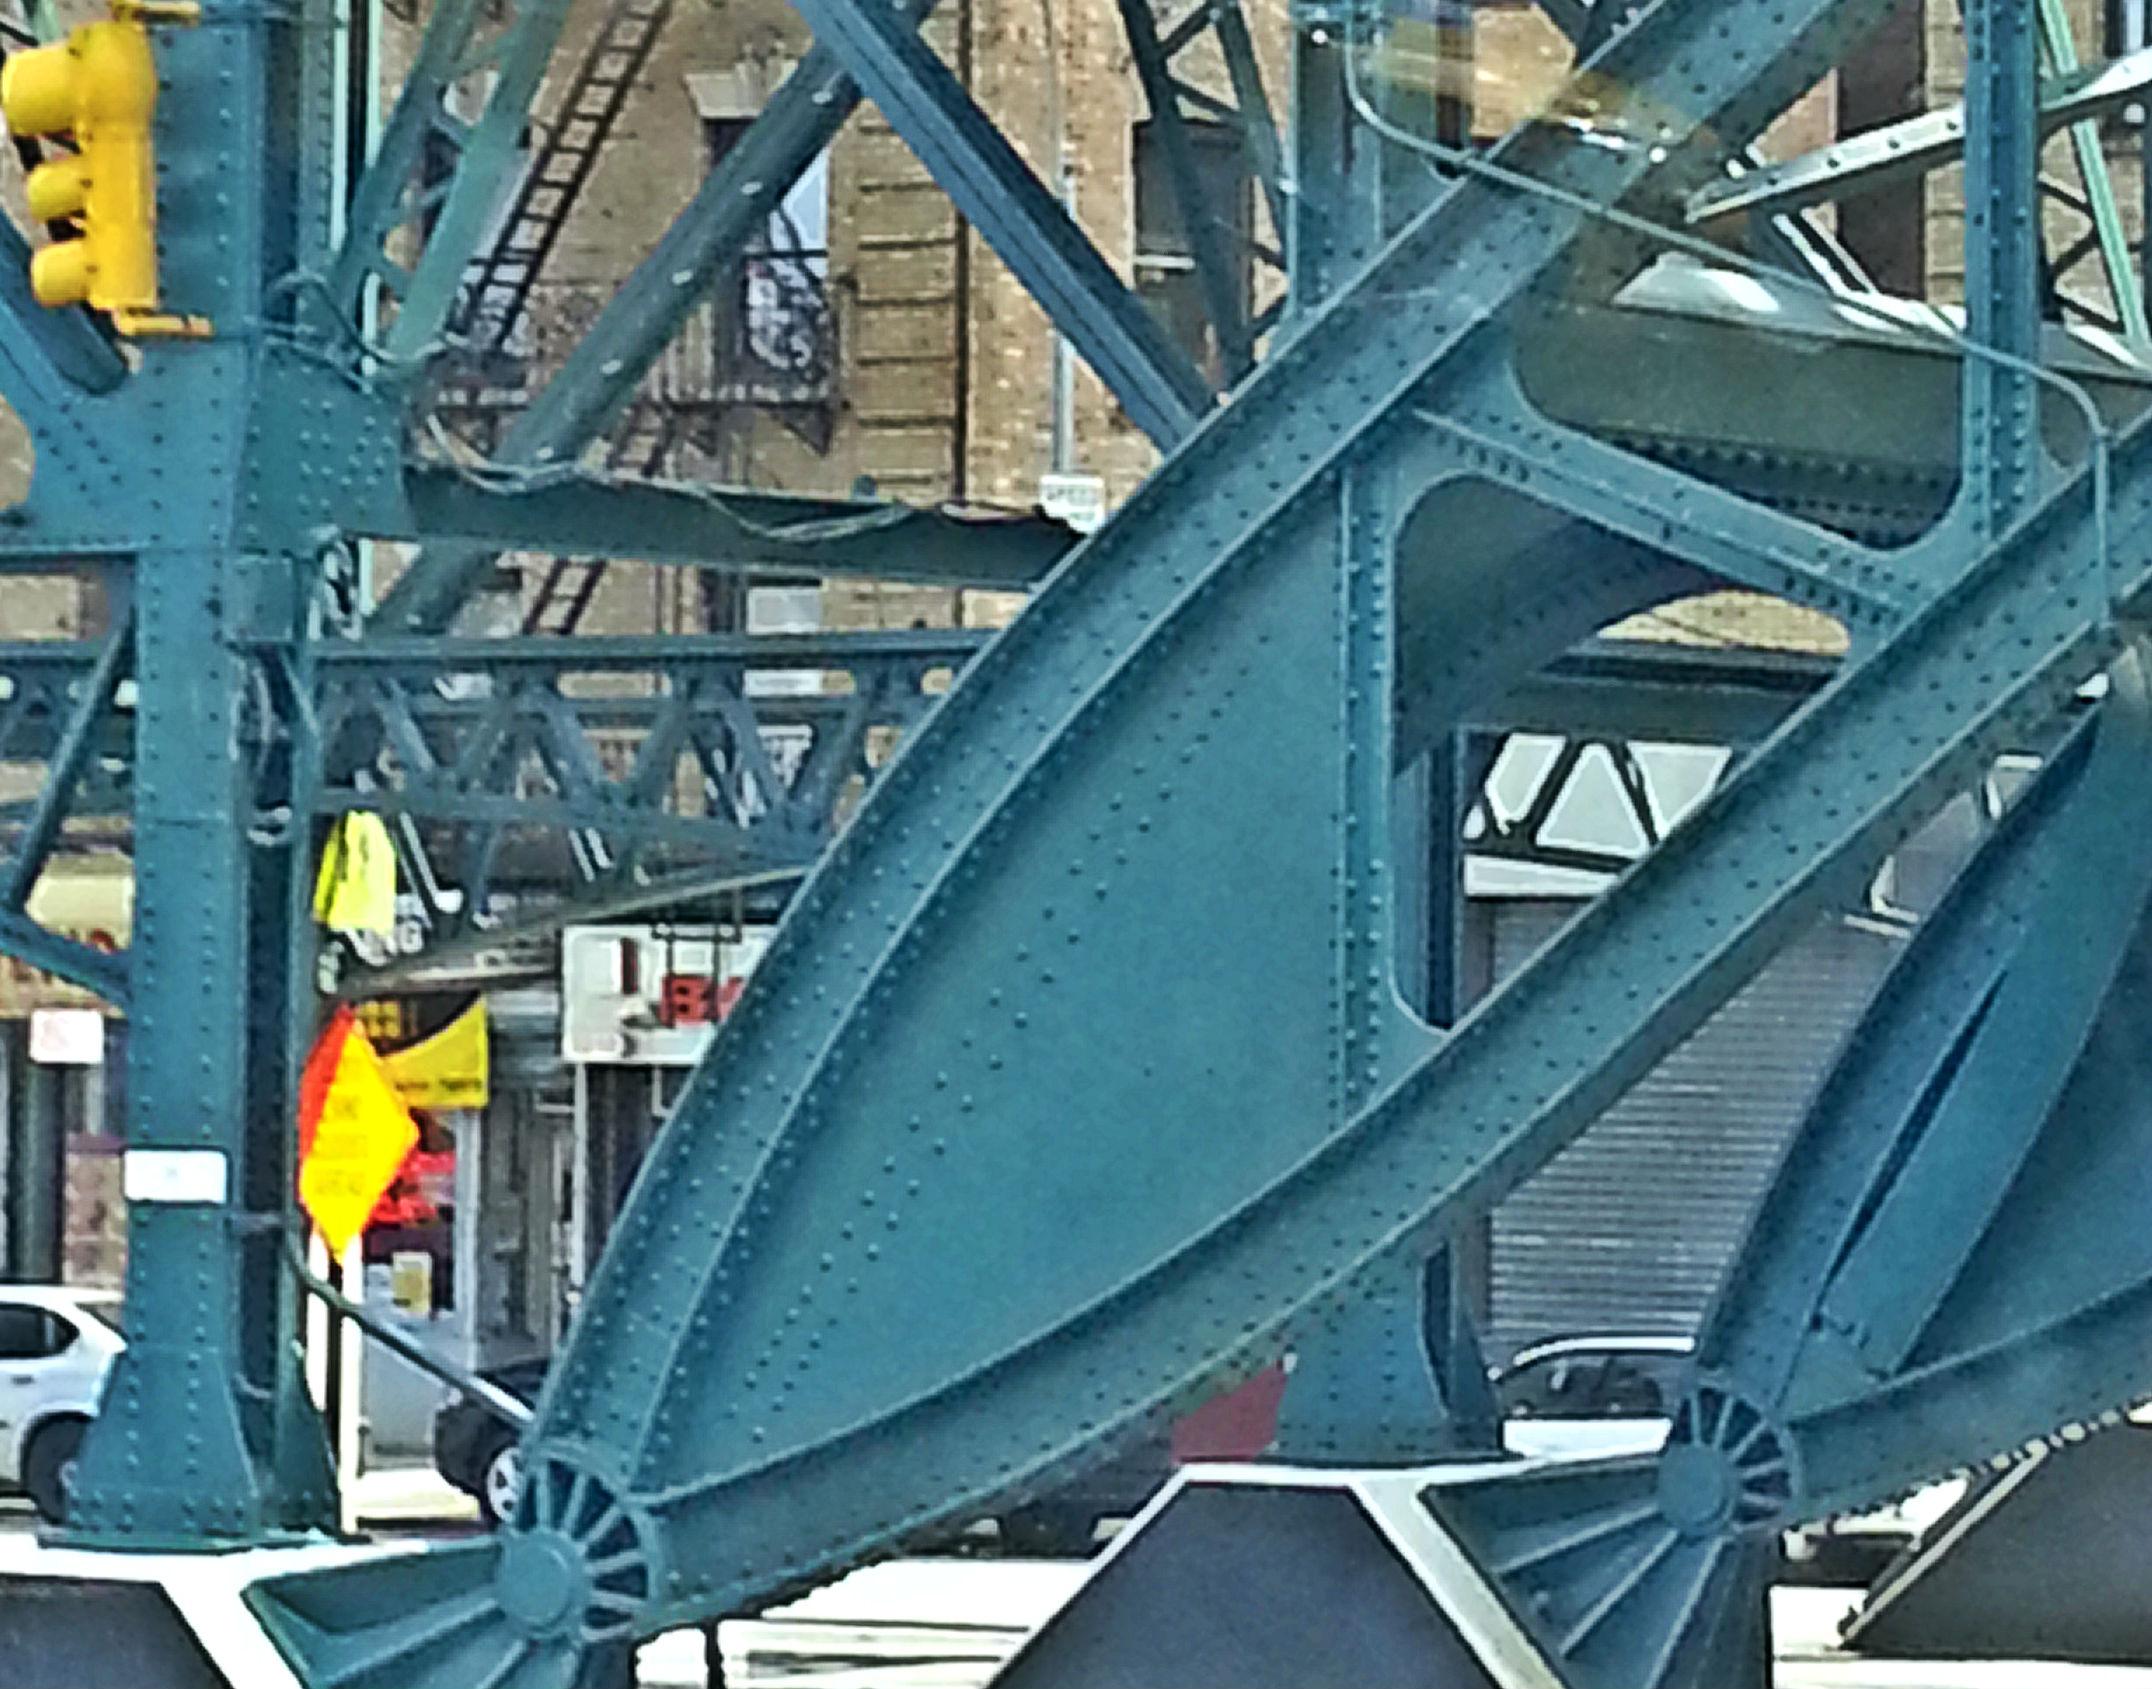 puente de harlem.jpg